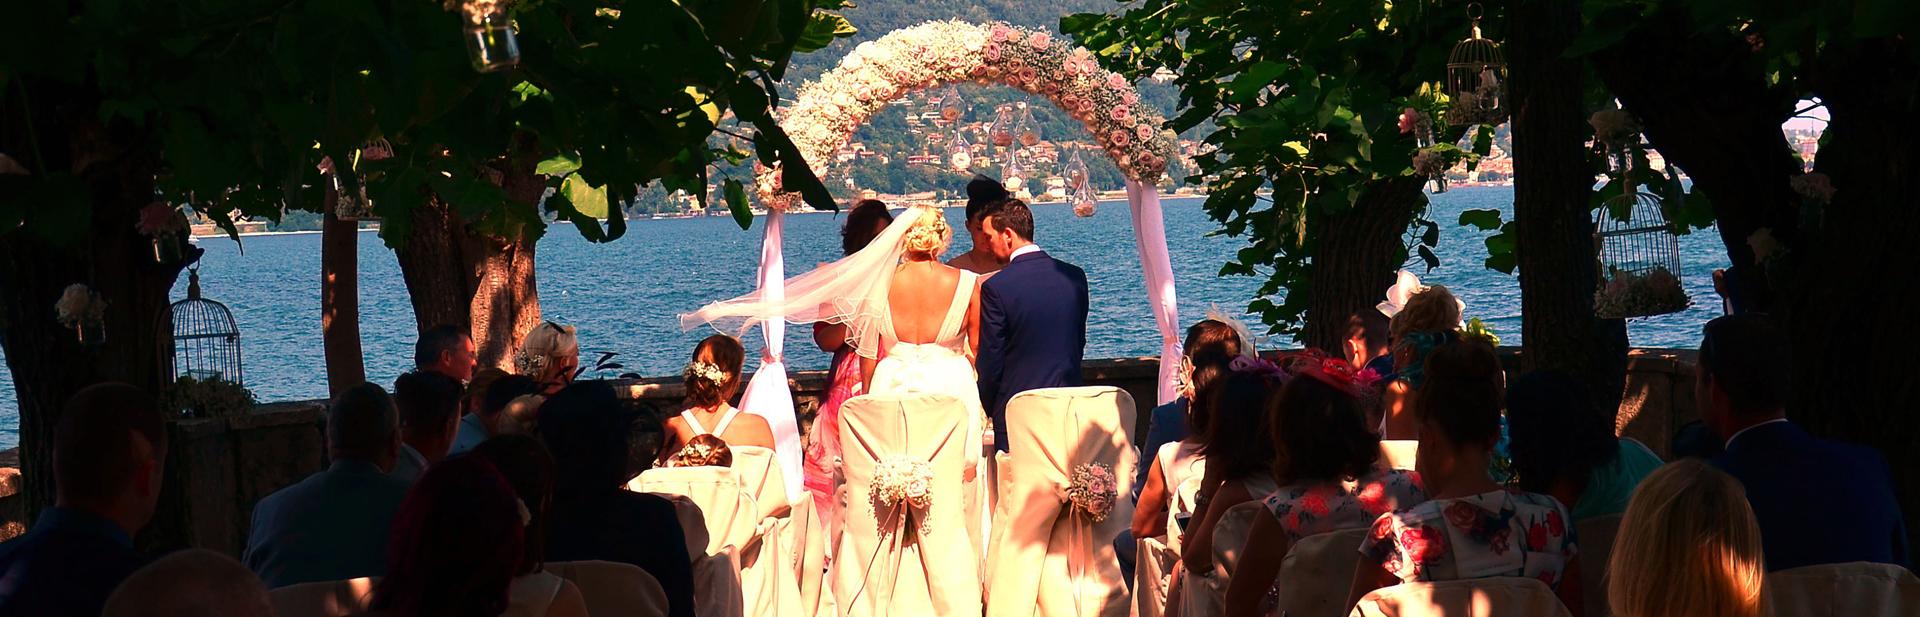 Celebrante Matrimonio Simbolico Piemonte : Riti nuziali u2013 cerimonie laiche